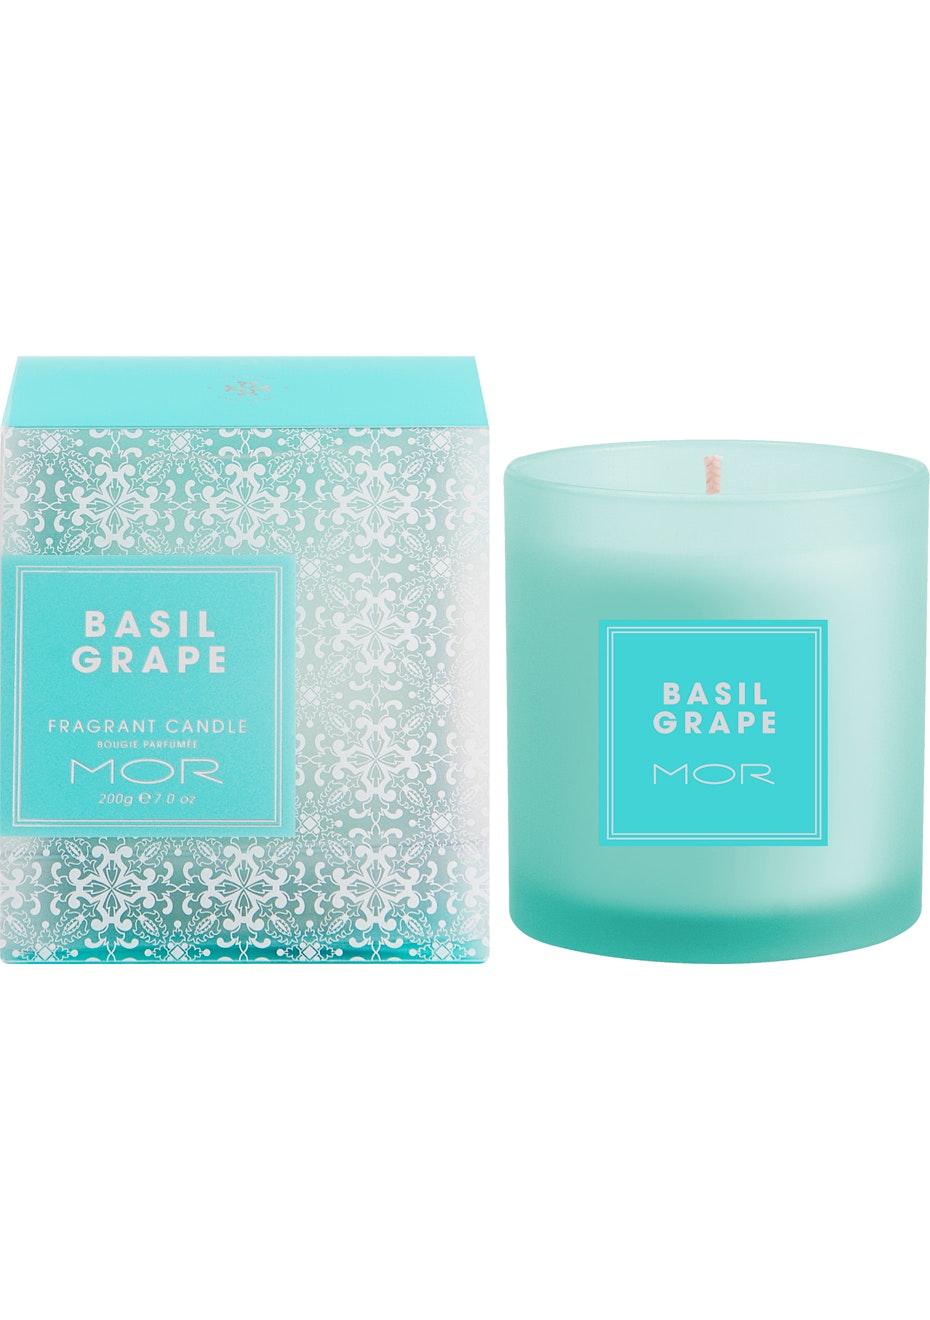 MOR - Fragrant Candle 200G Basil Grape